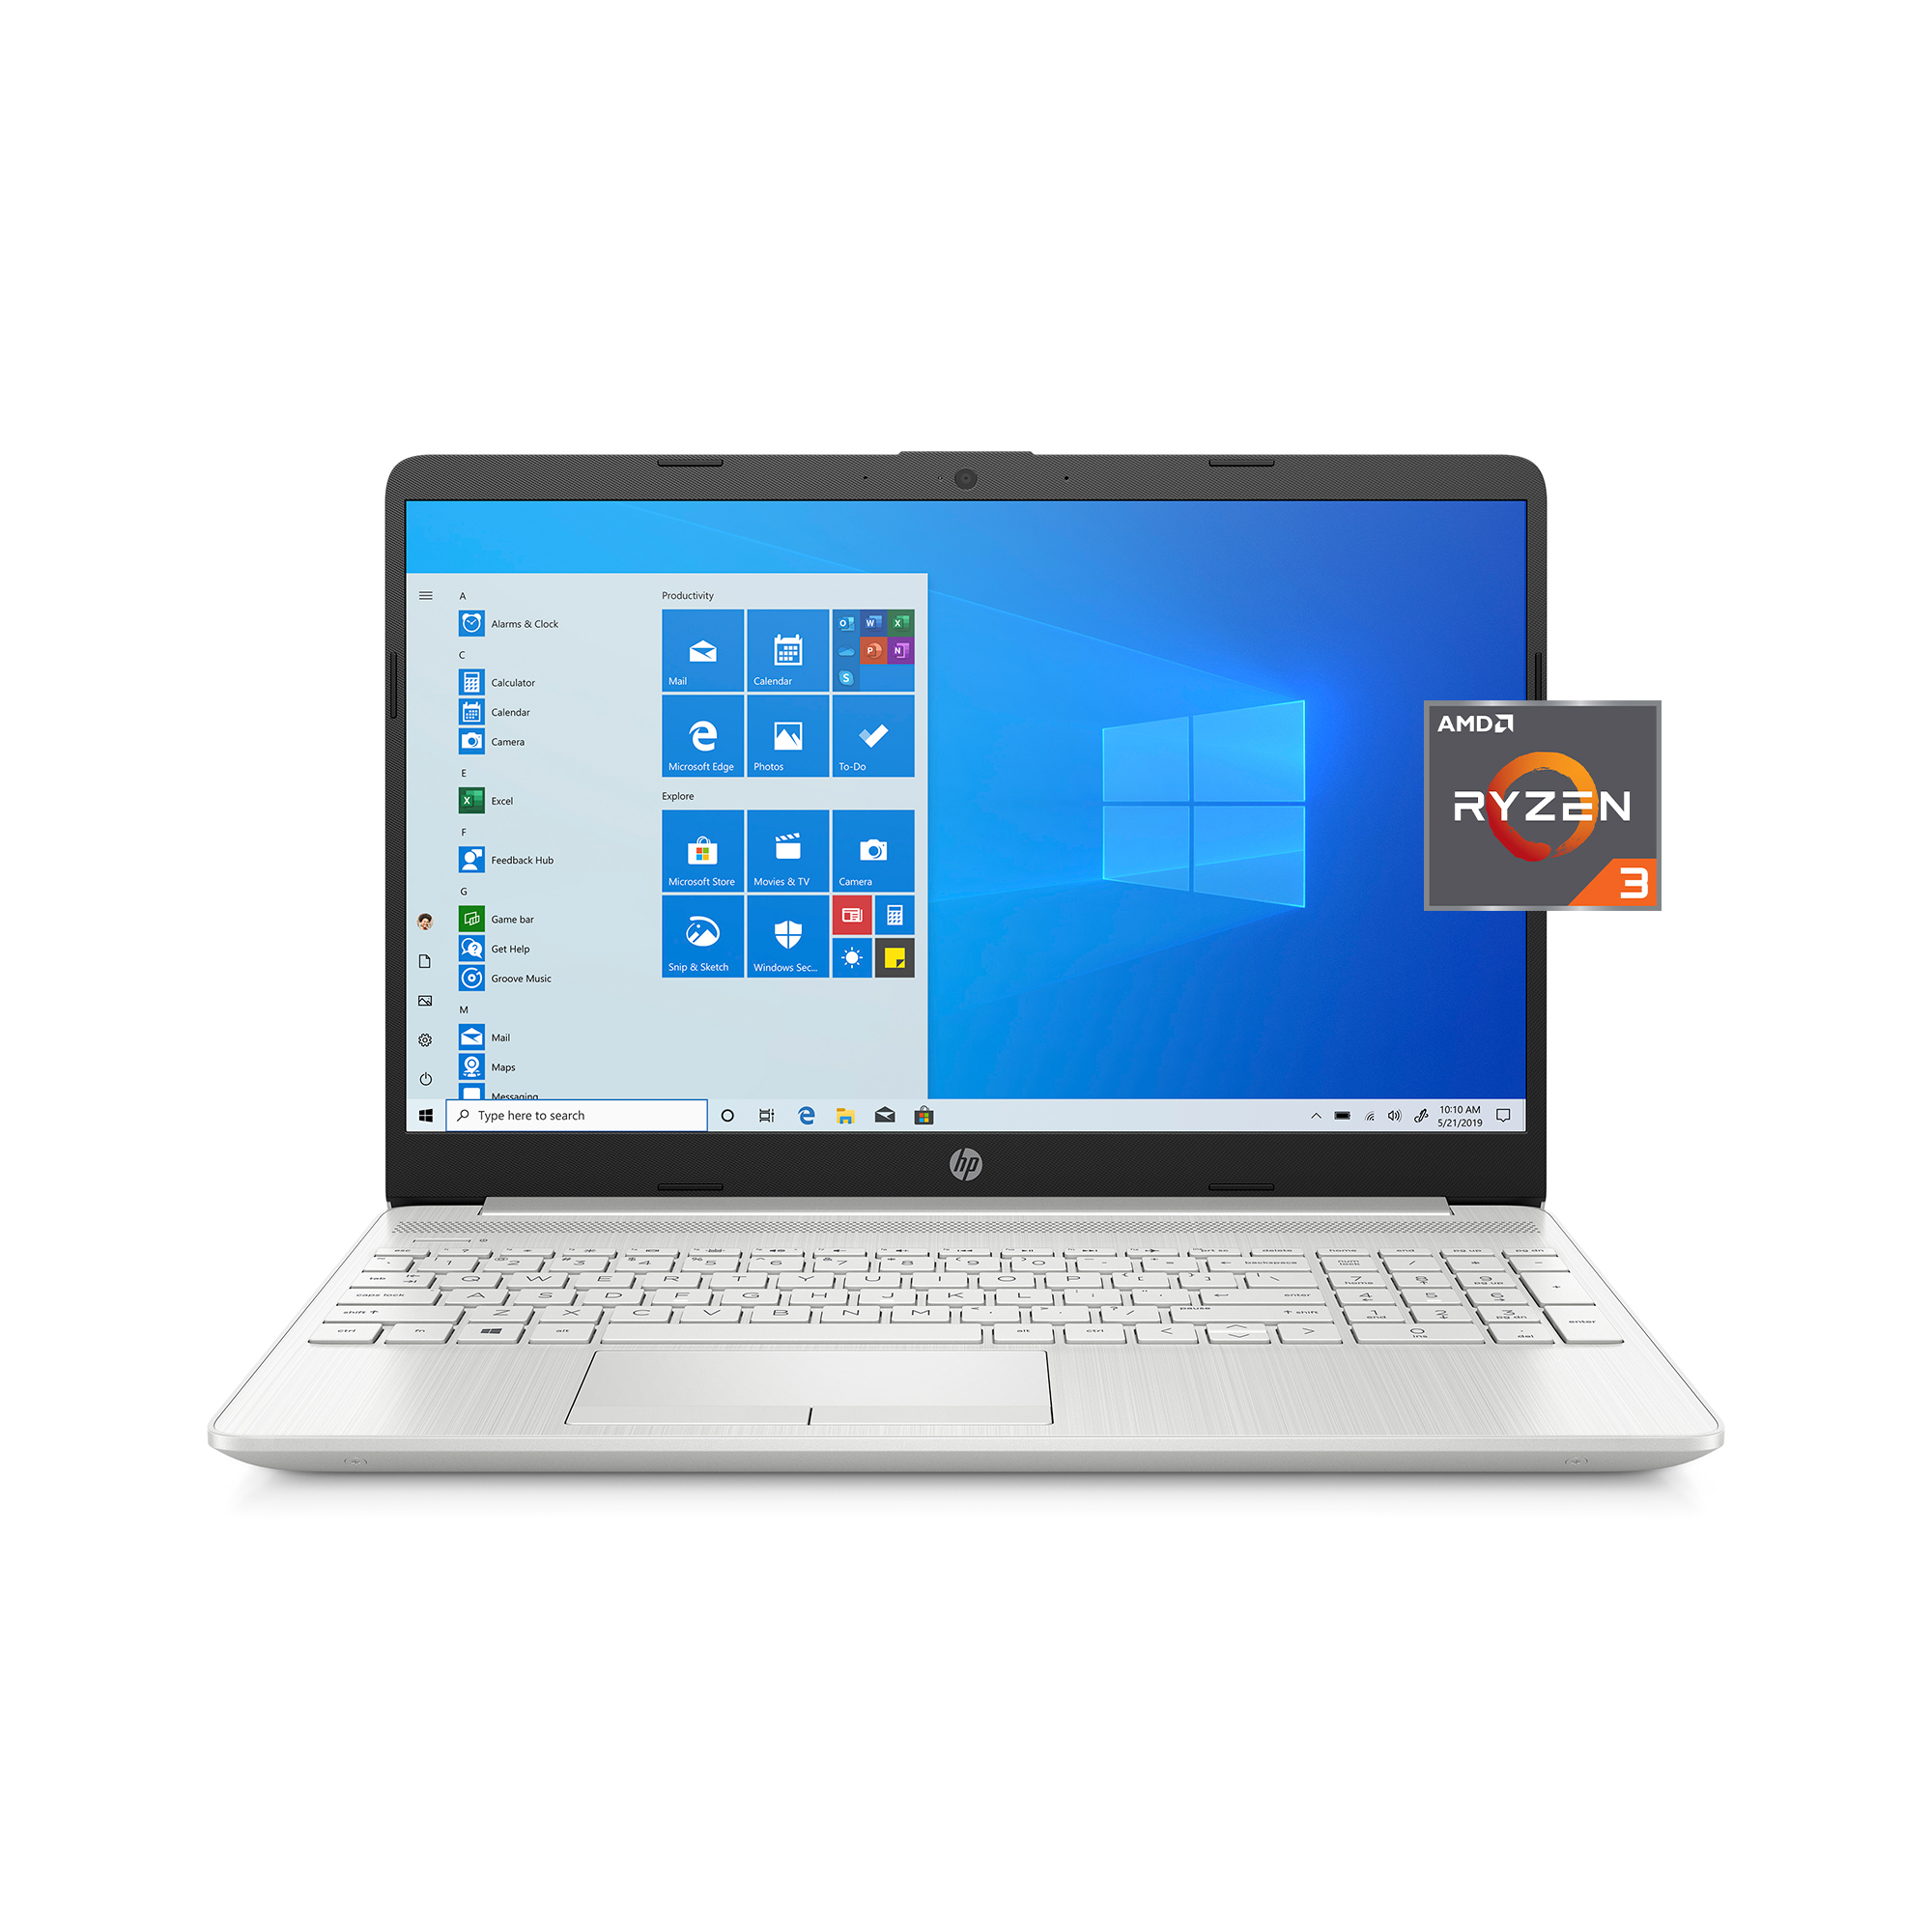 HP 15-gw0010wm 15.6″ Laptop, AMD Ryzen 3, 4GB RAM, 1TB HDD + 128GB SSD SSD, (Google Classroom Compatible).